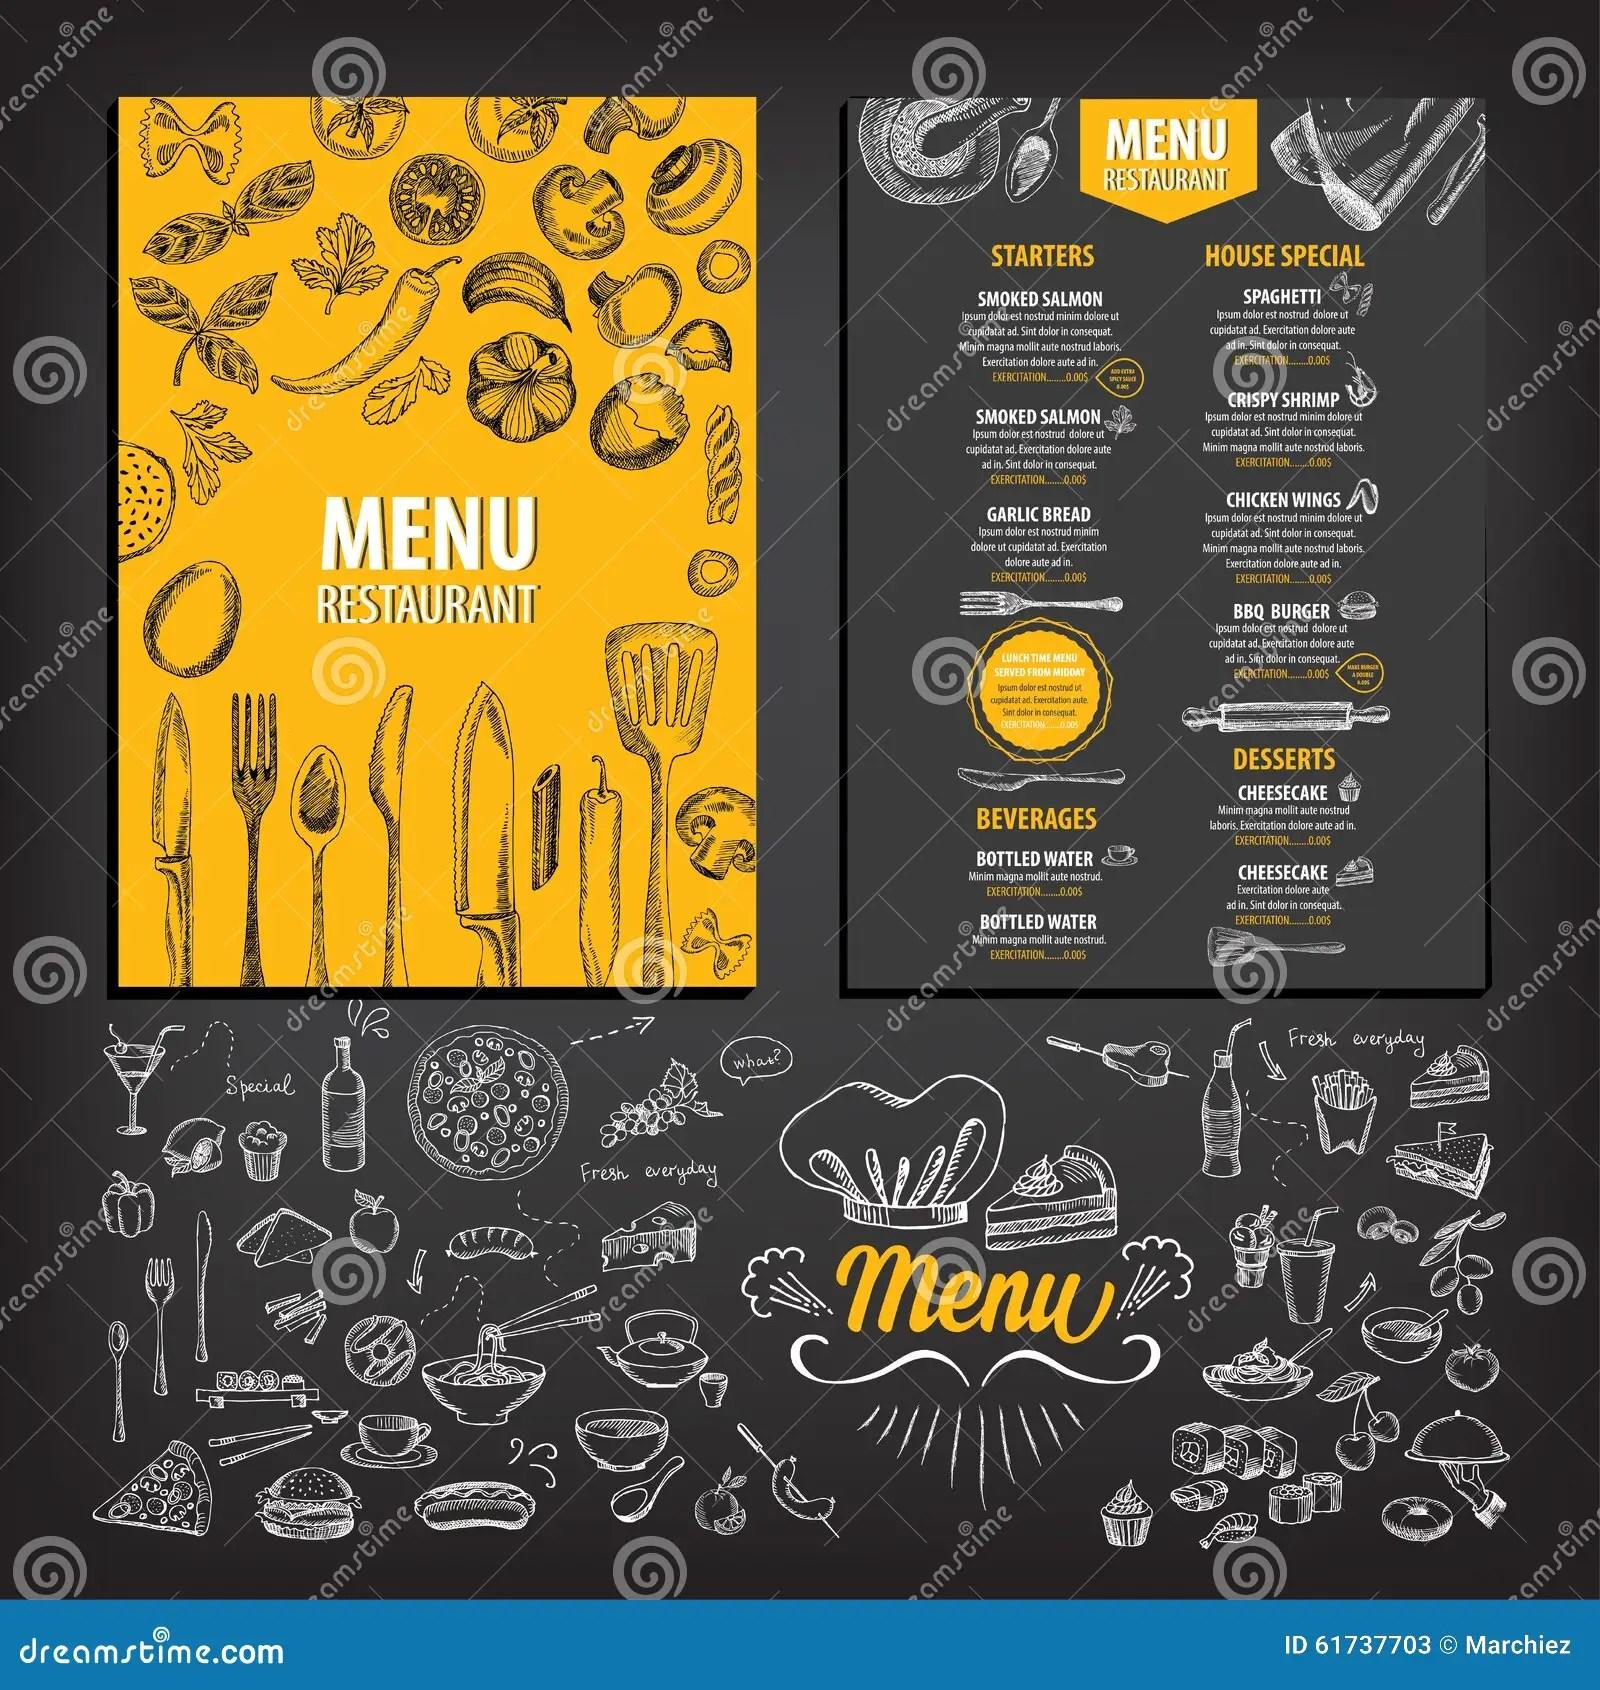 Restaurant Cafe Menu Template Design Stock Vector  Image 61737703